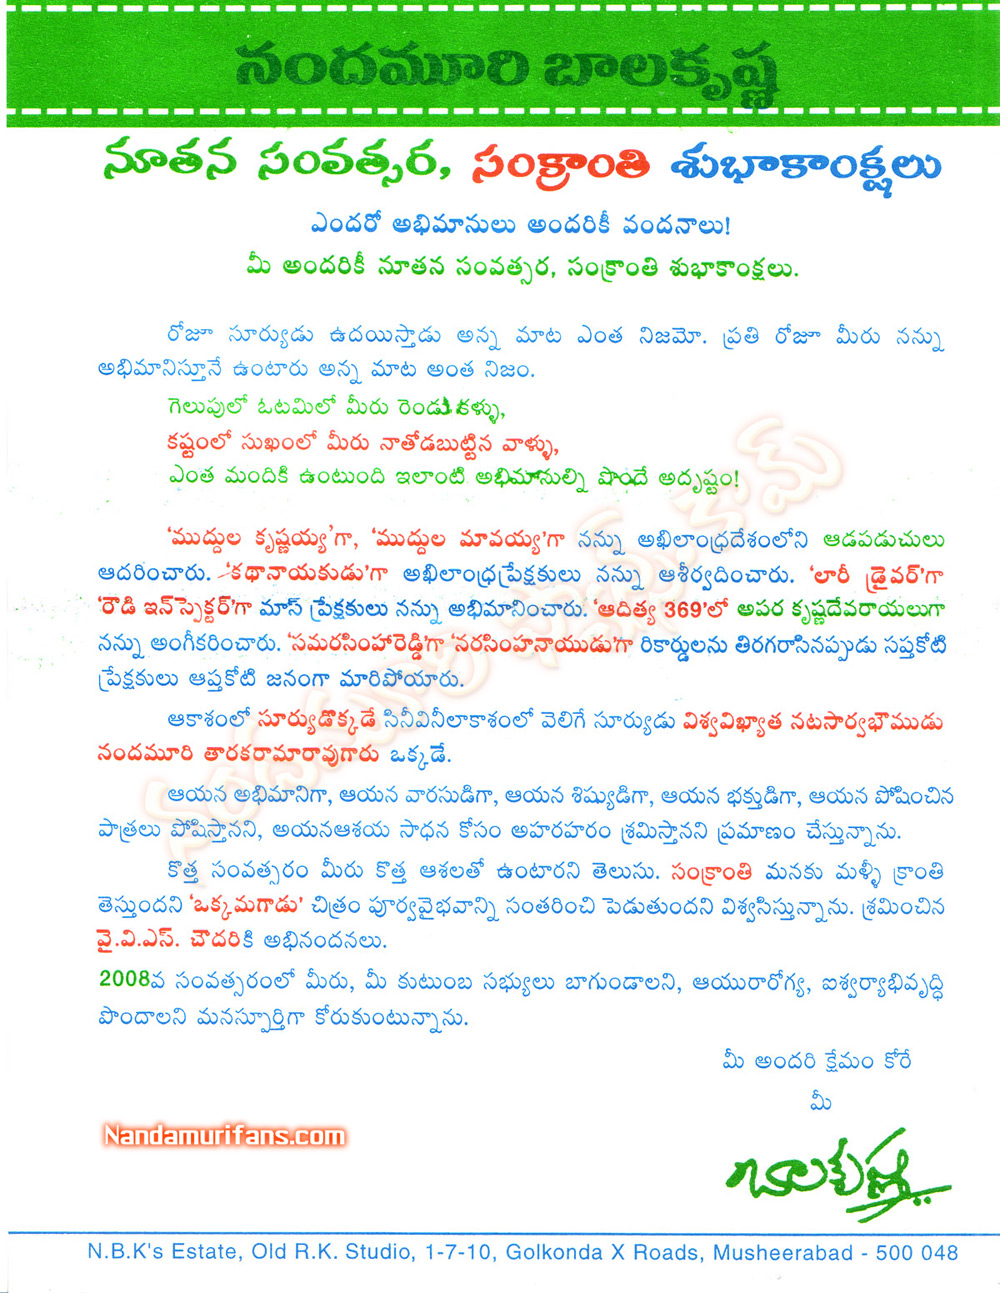 NBK Letter to fans